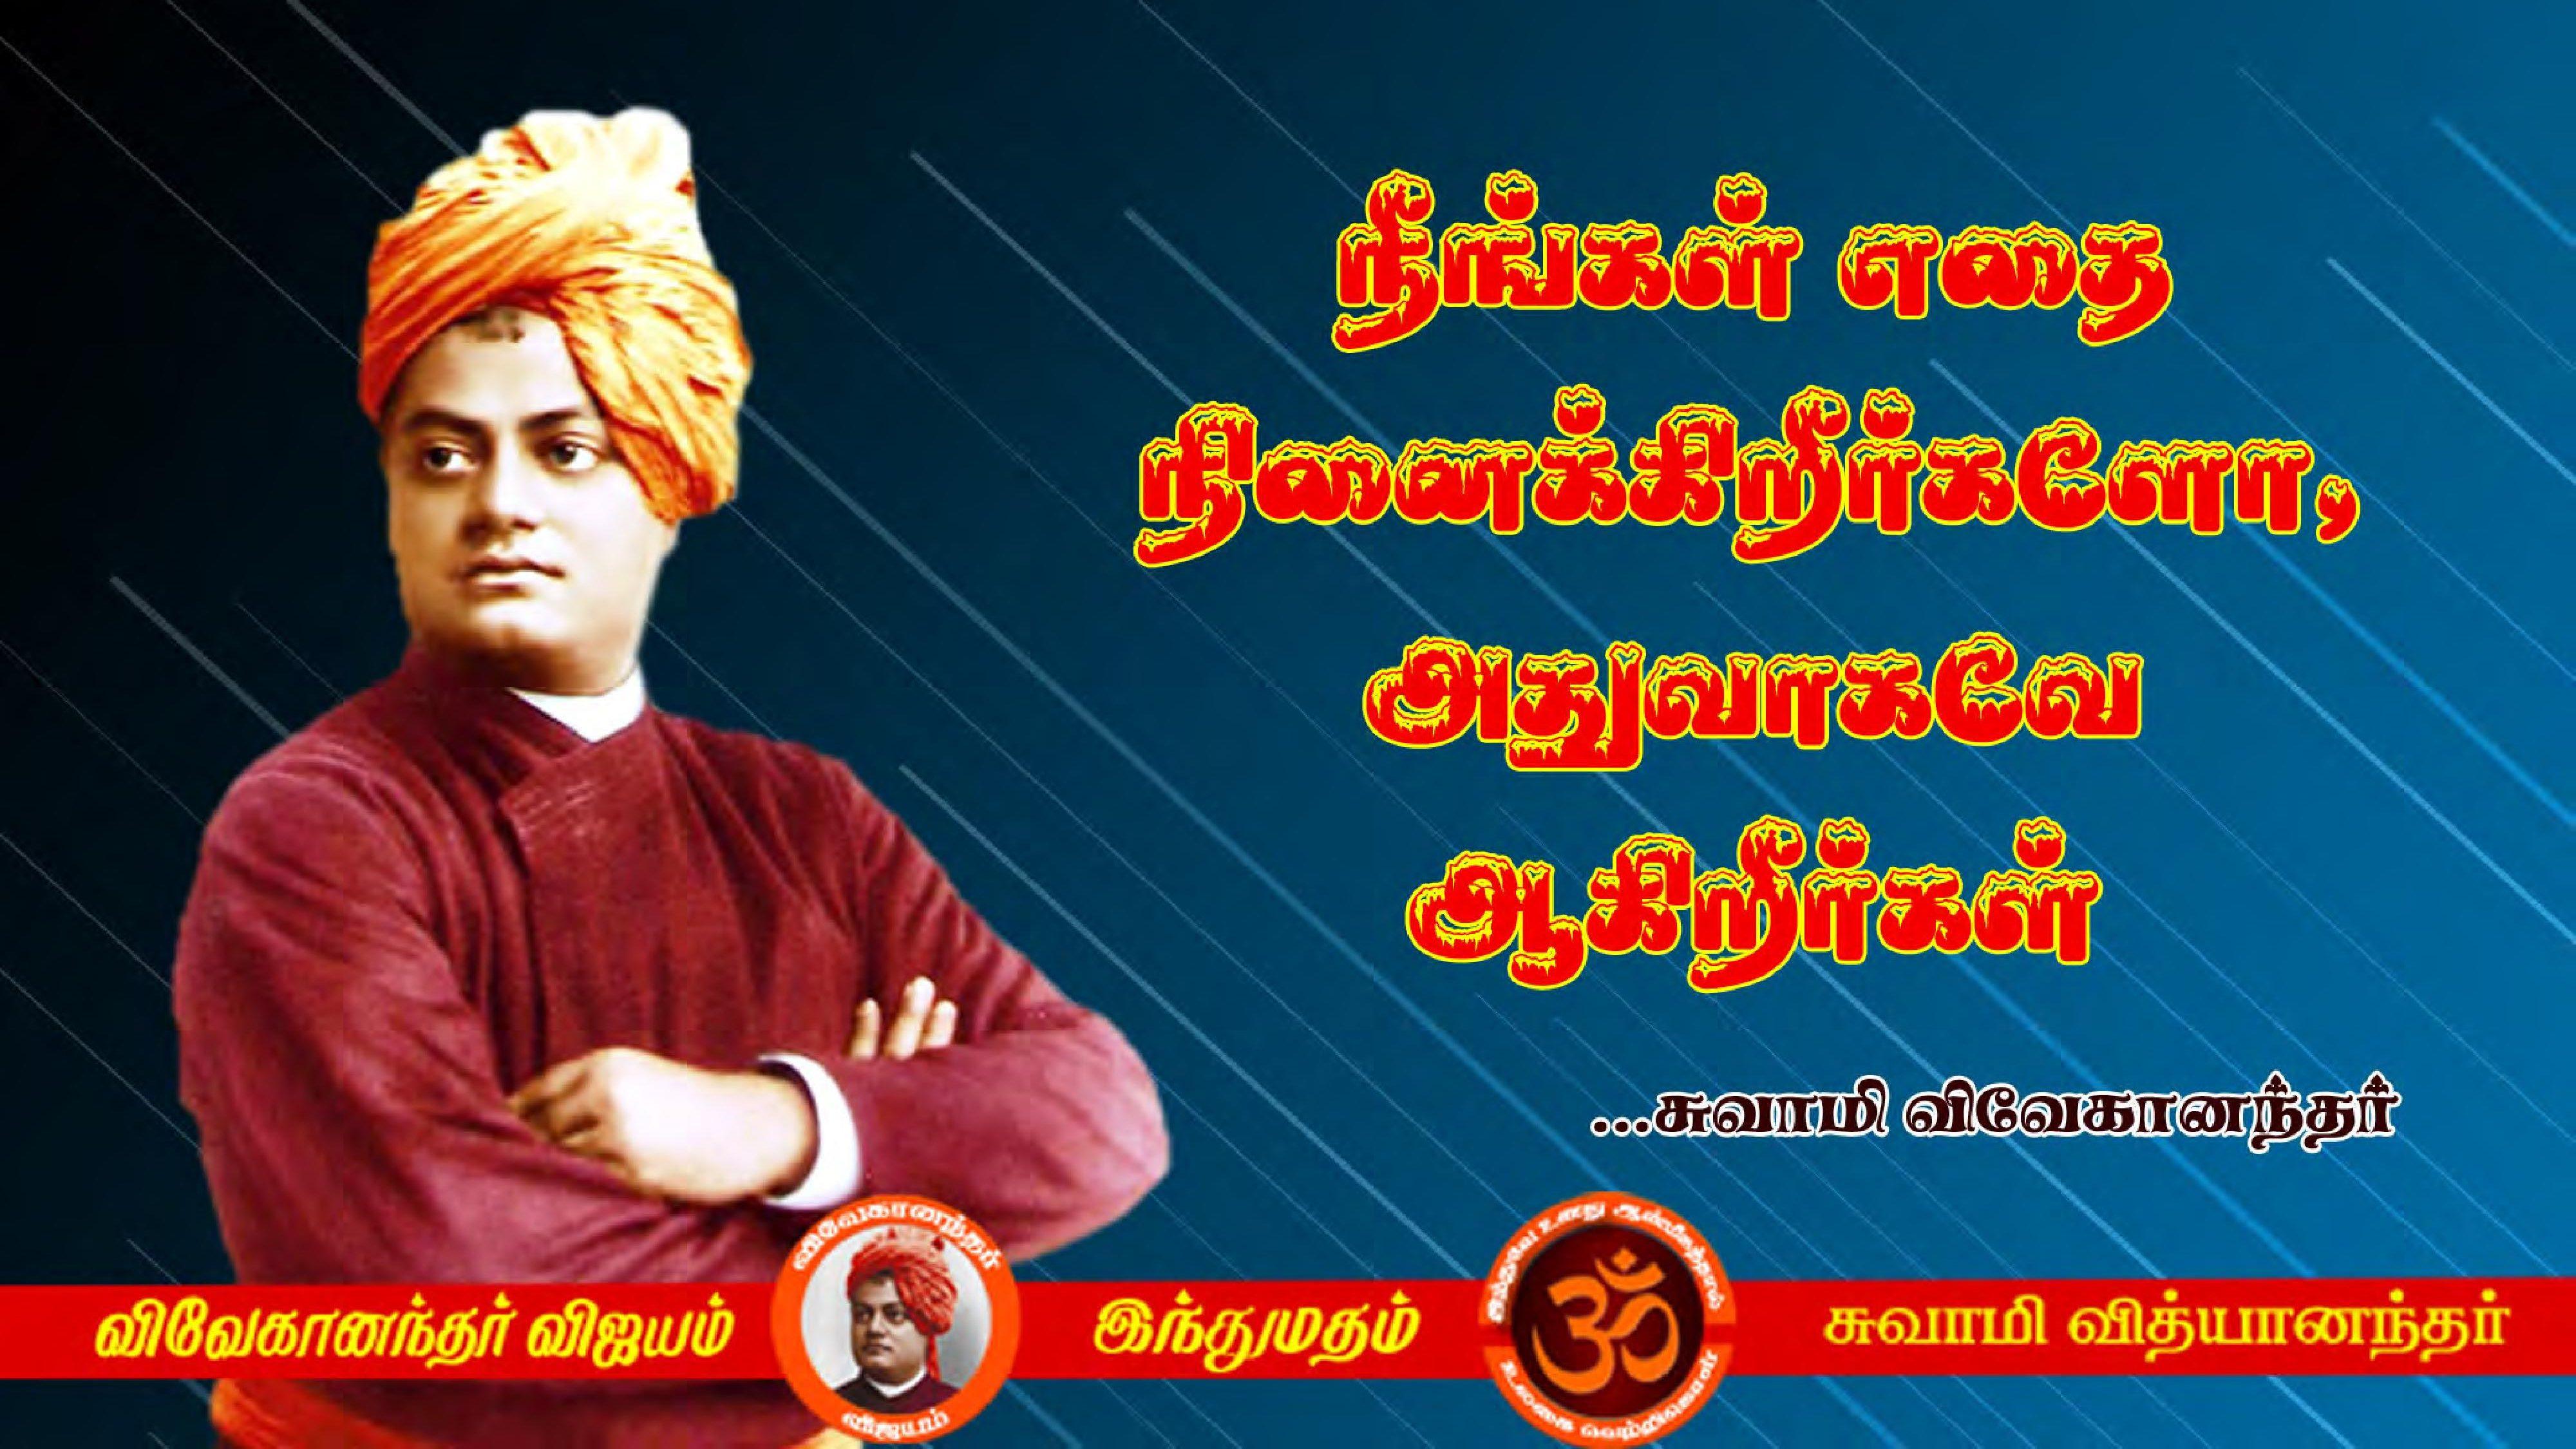 tamil swami vivekanand network swami vivekanand network